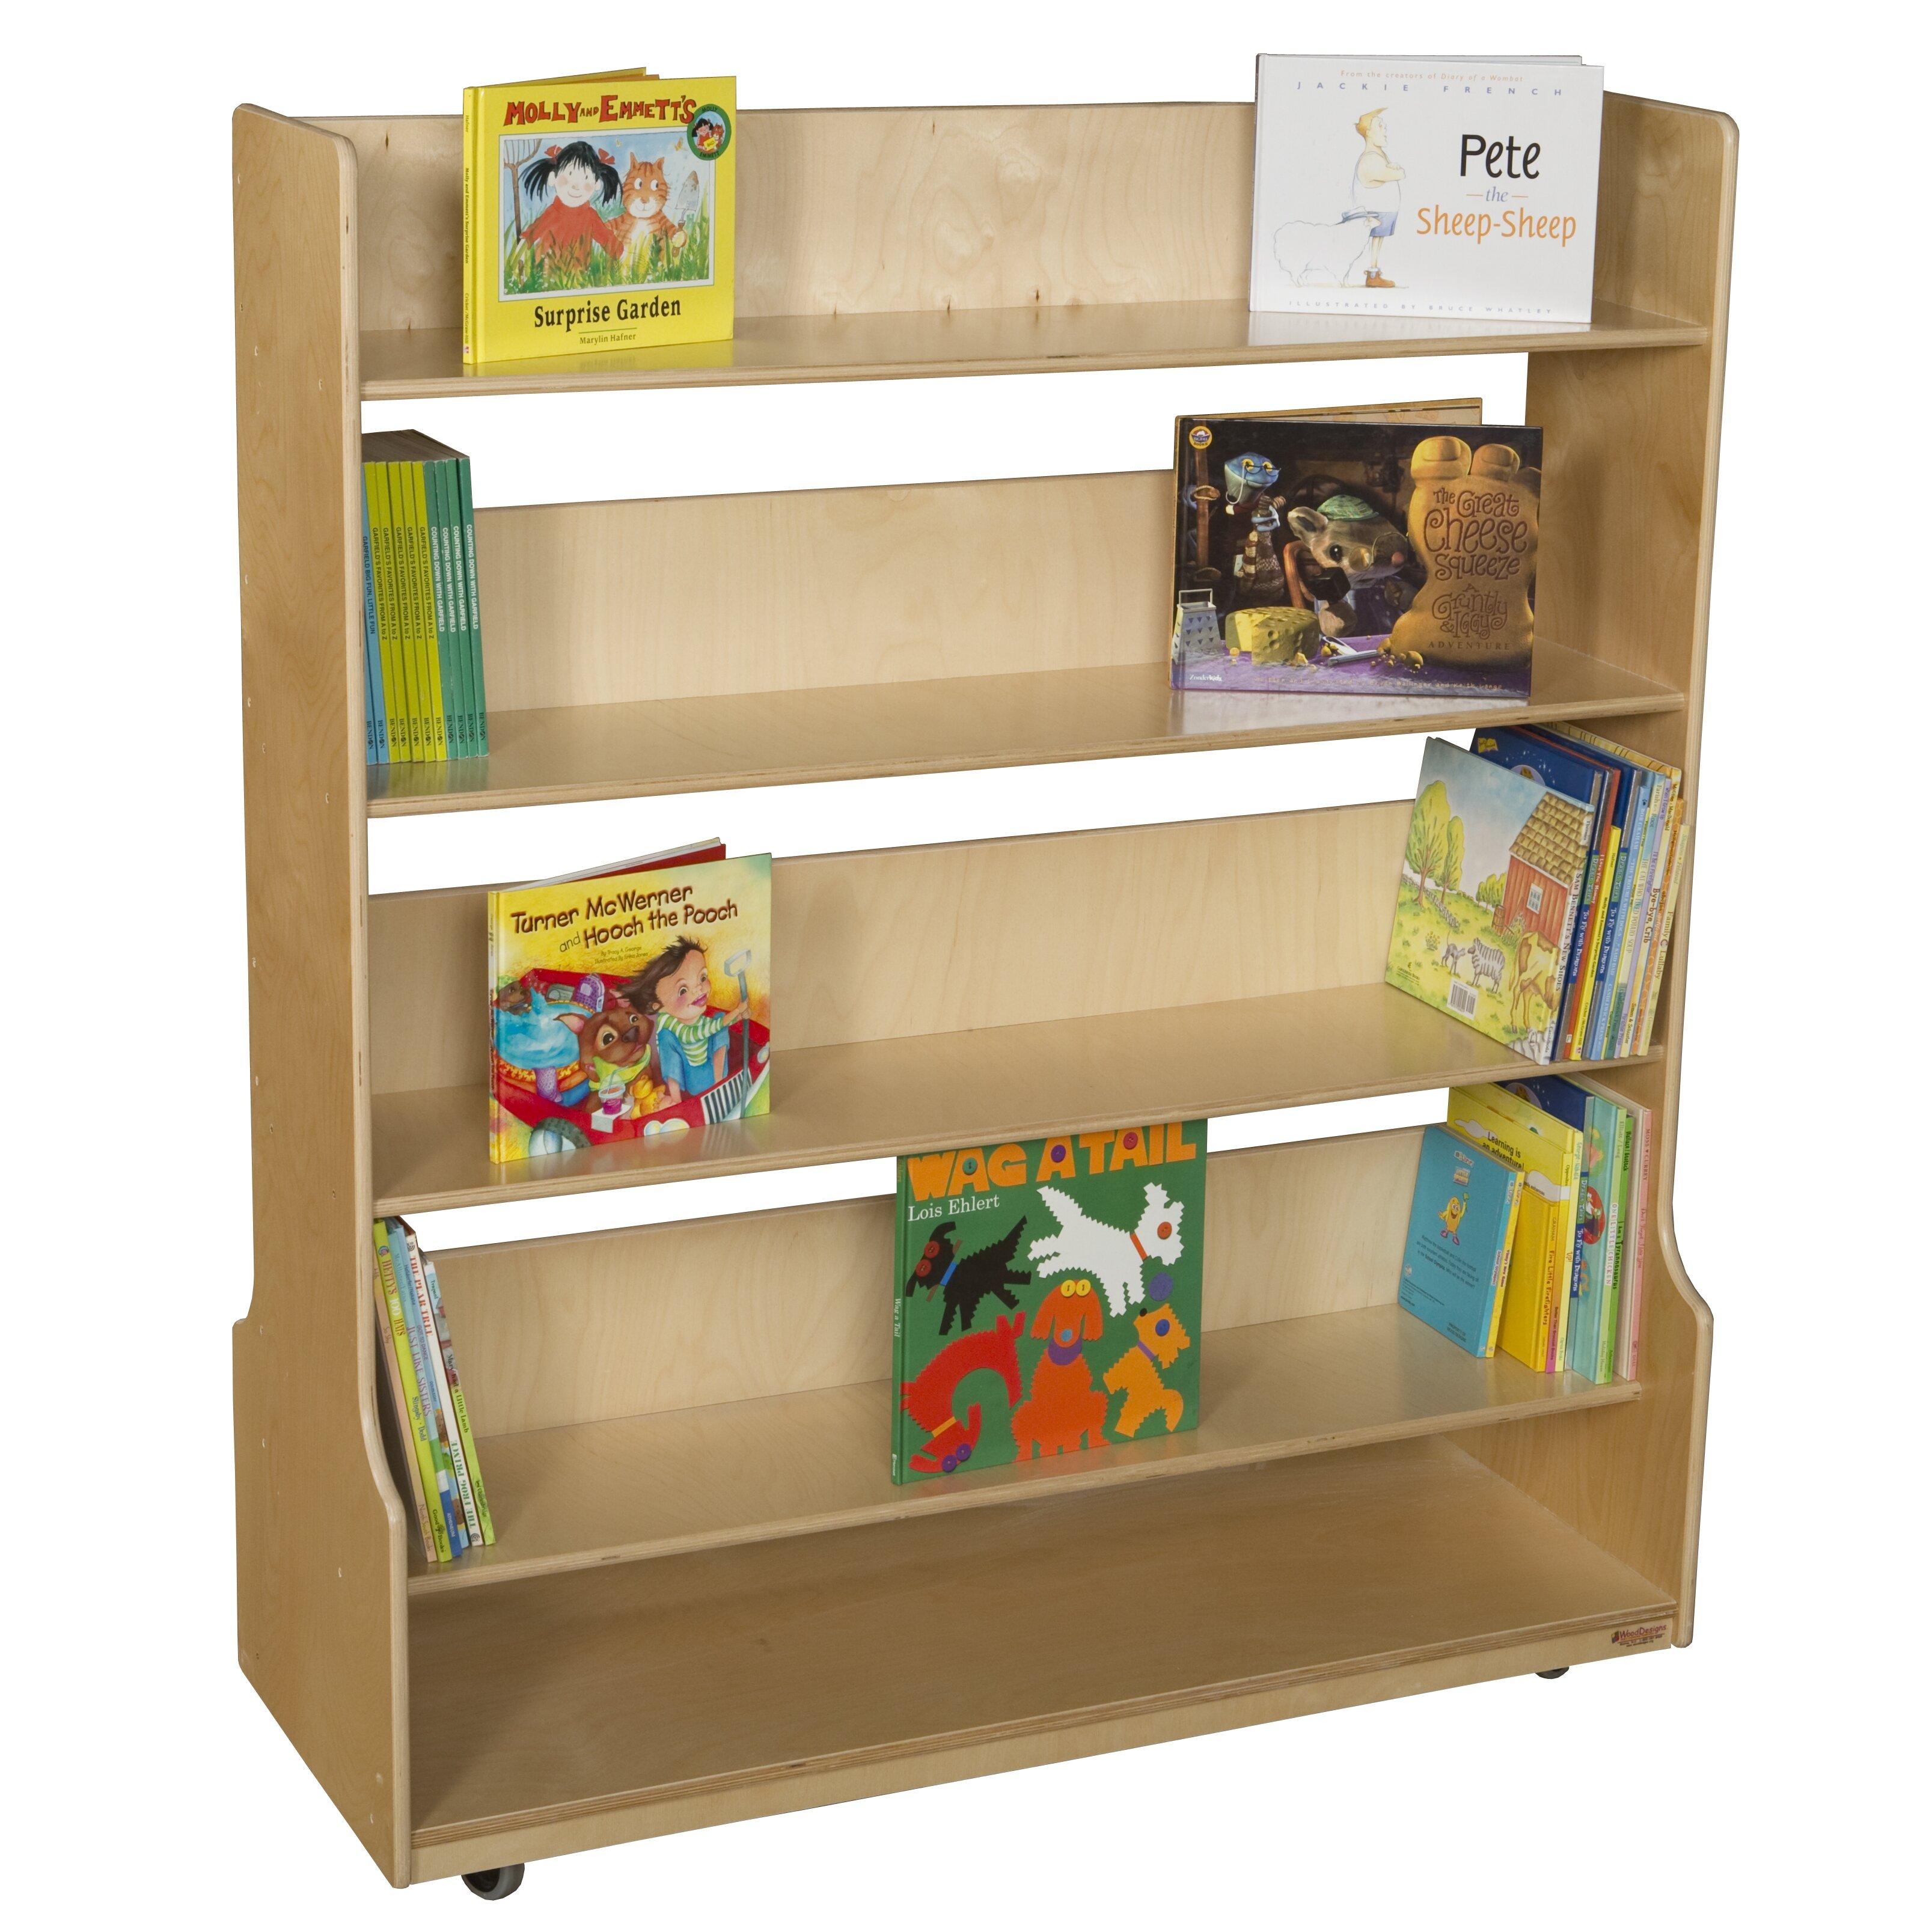 woodworking design books with popular creativity in ireland